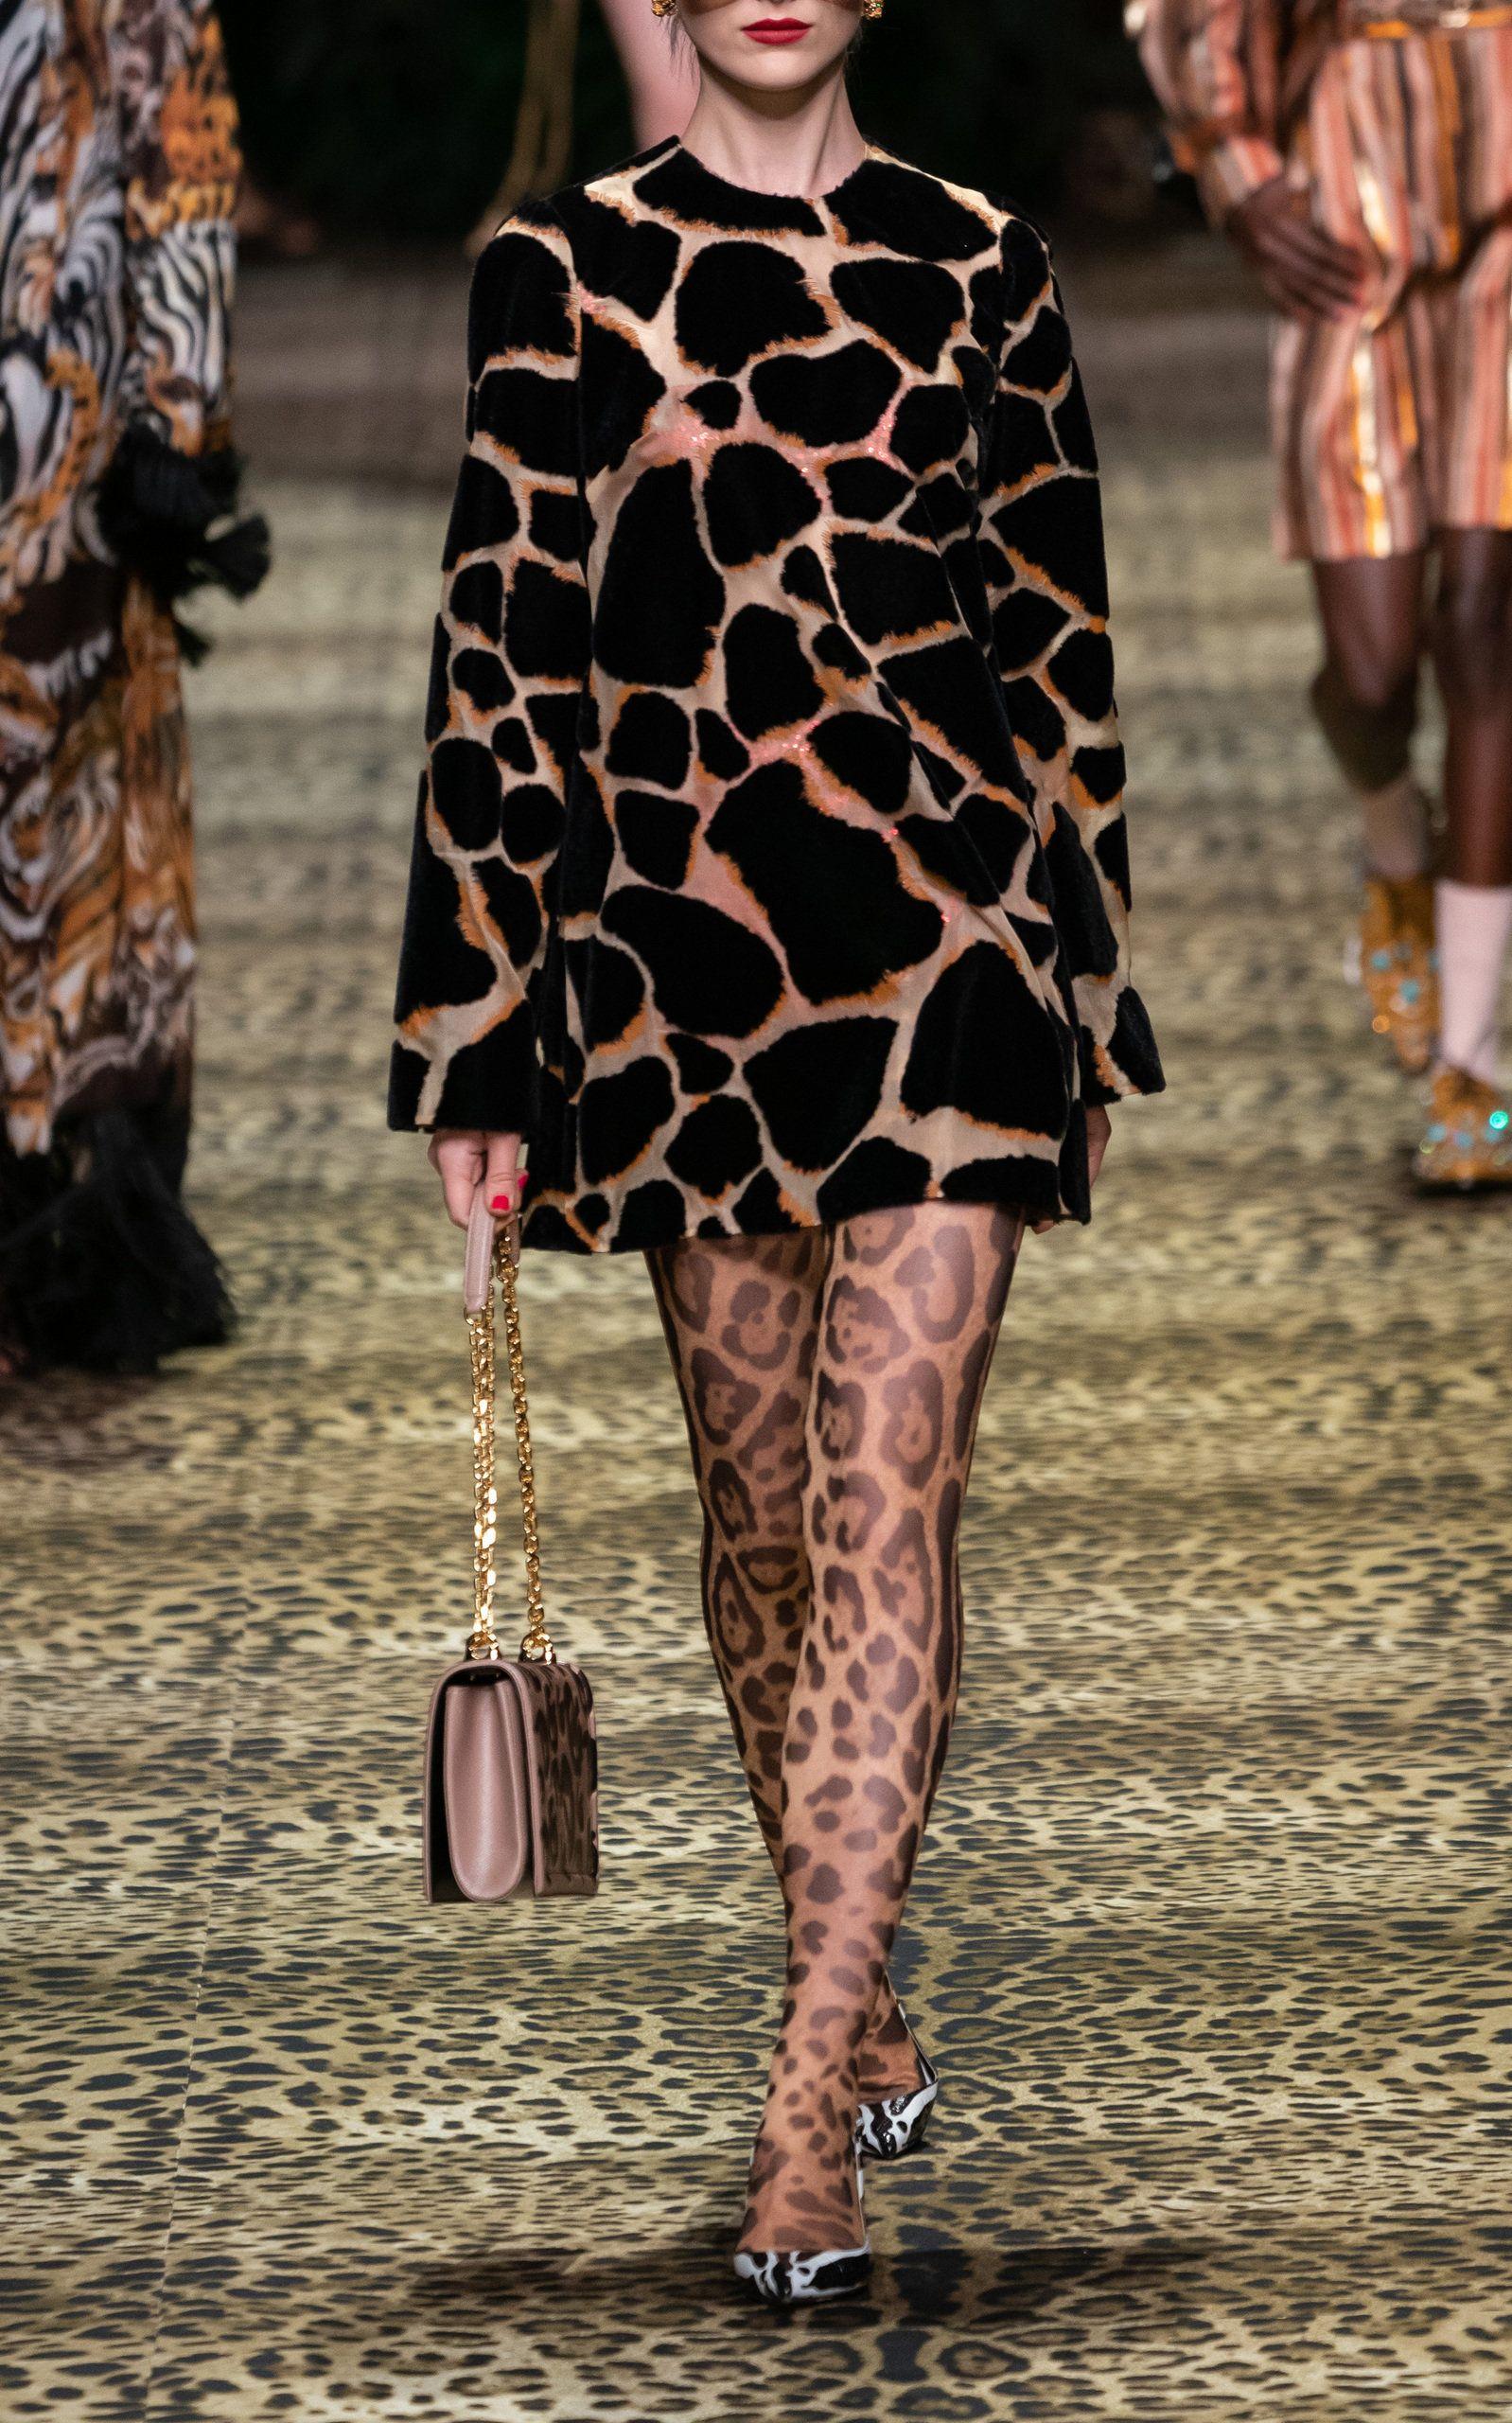 Extreme Mini Animal Print Dress By Dolce Gabbana Moda Operandi In 2020 Animal Print Dresses Dolce And Gabbana Animal Print Tights